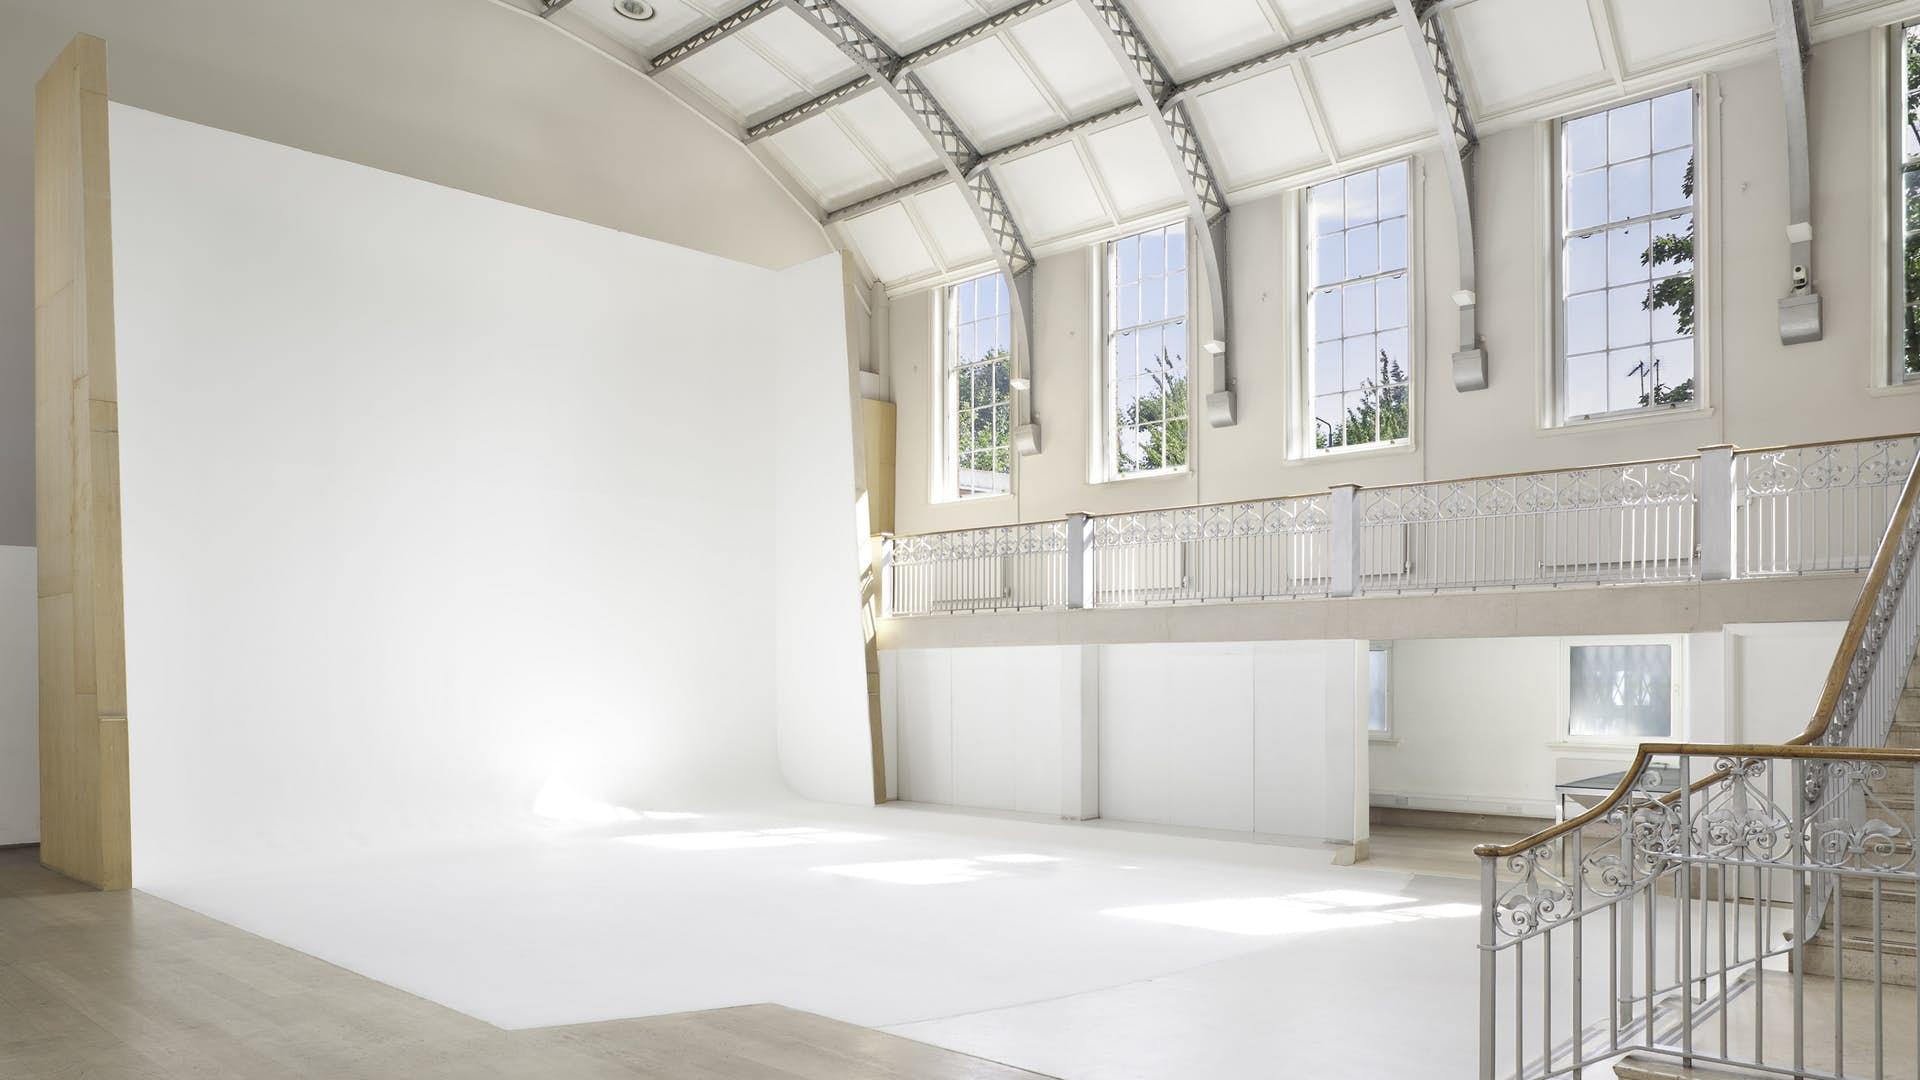 blank canvas venue 3 Blank canvas or ready made venue